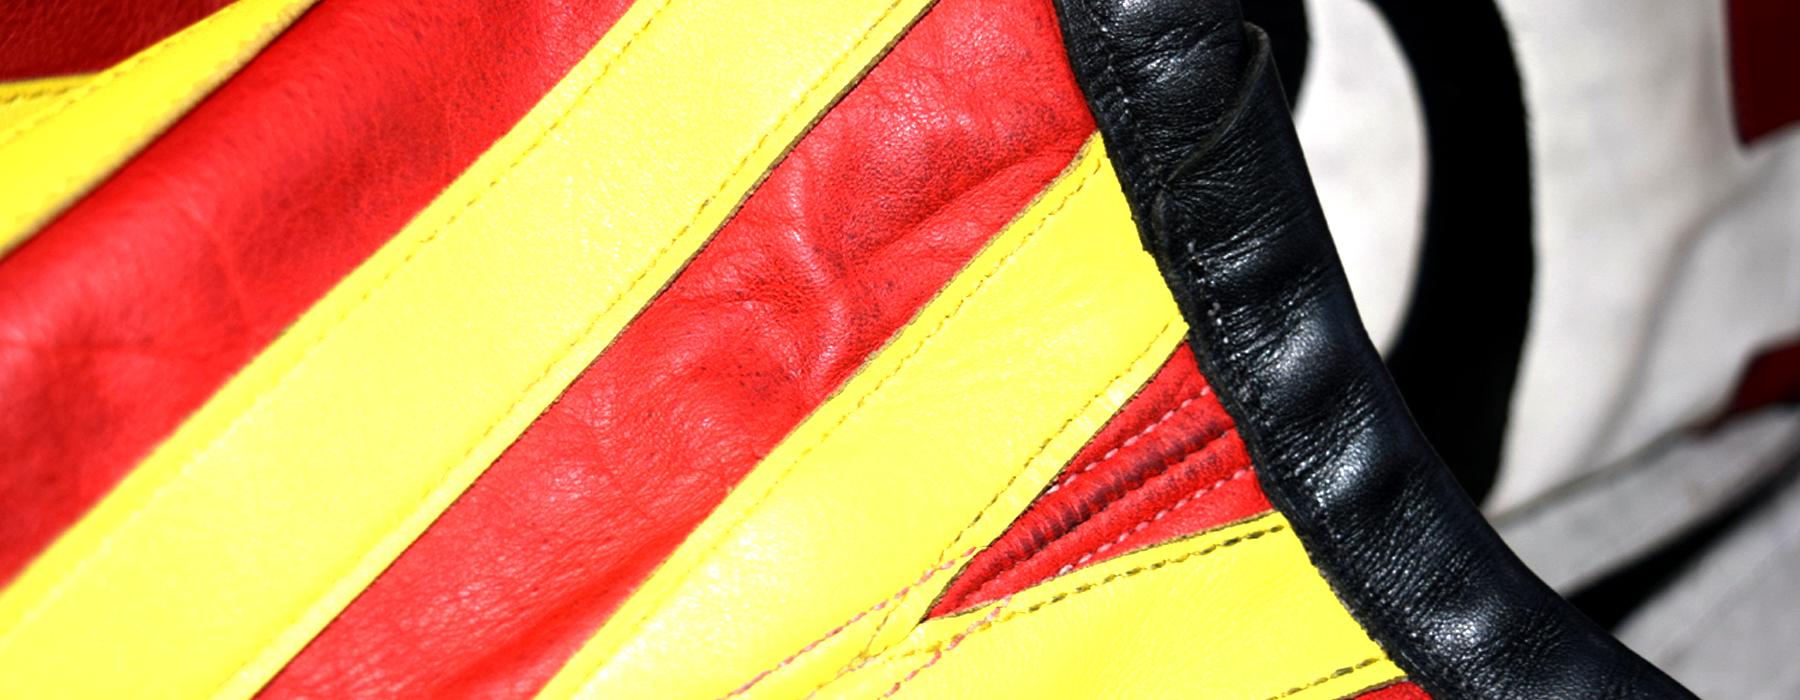 de curae | Candyman Racing Suit, vest both sides detail – Thorsten Schlesinger